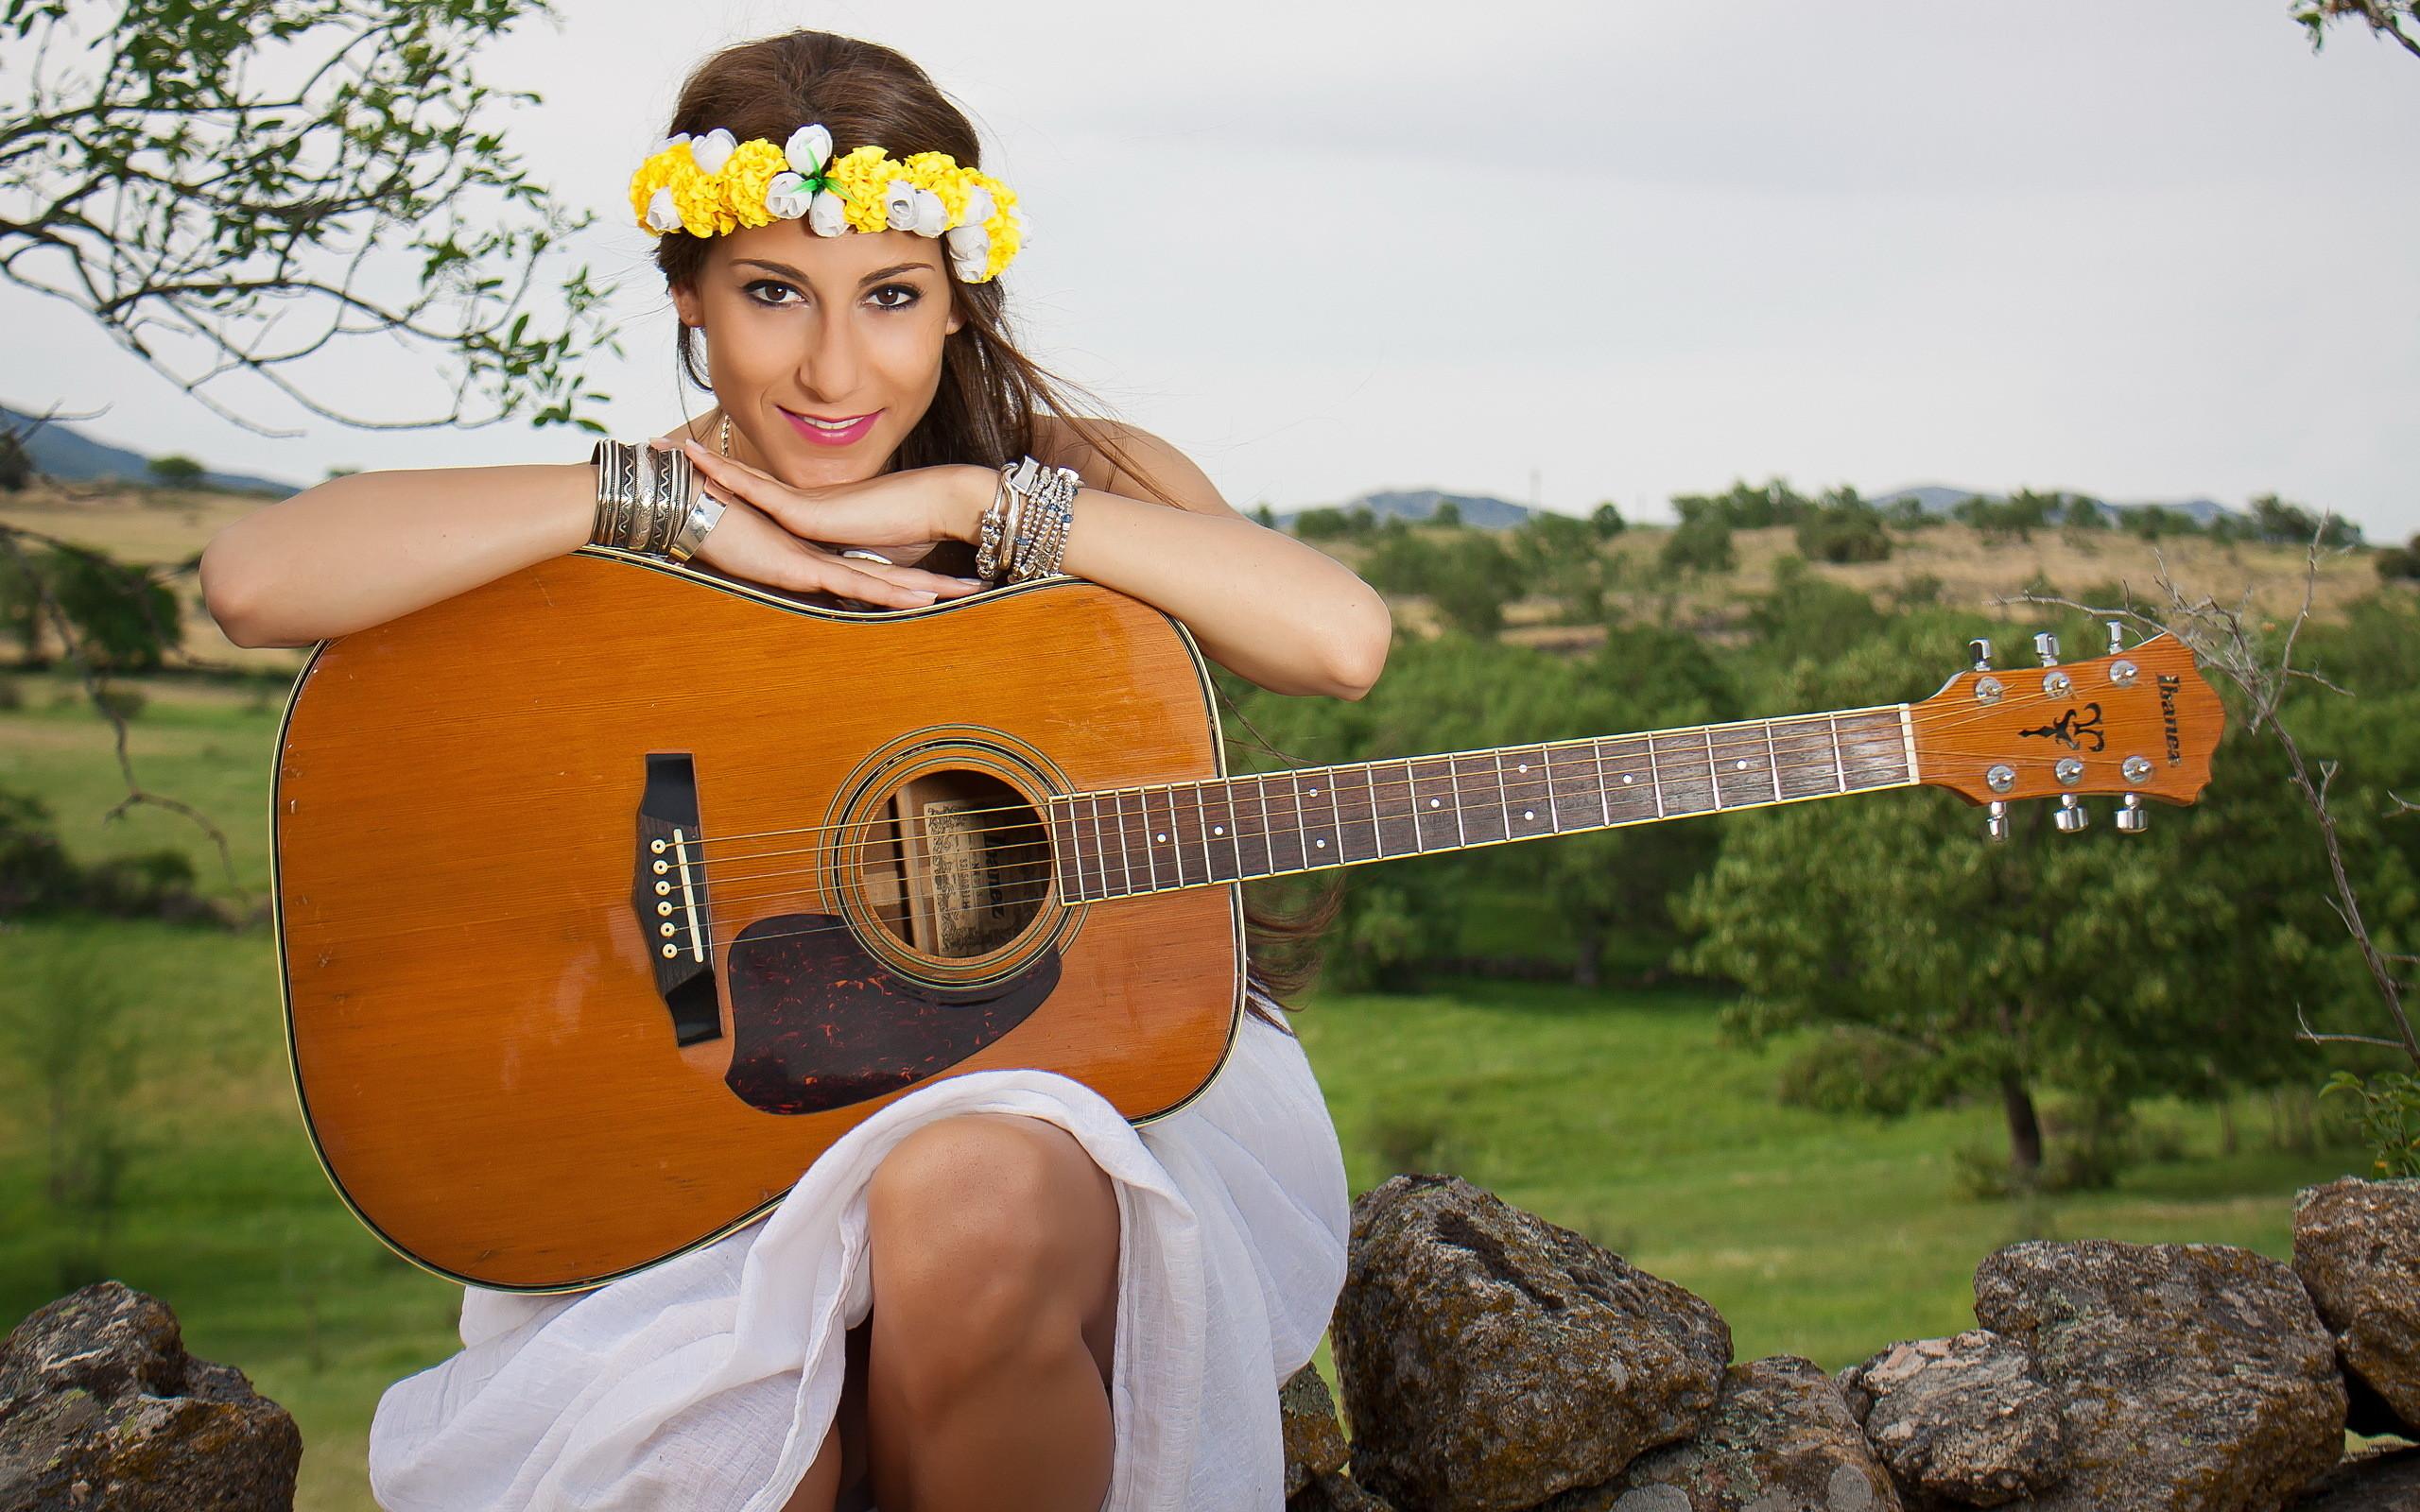 wallpaper.wiki-Girl-guitar-music-background-country-singer-